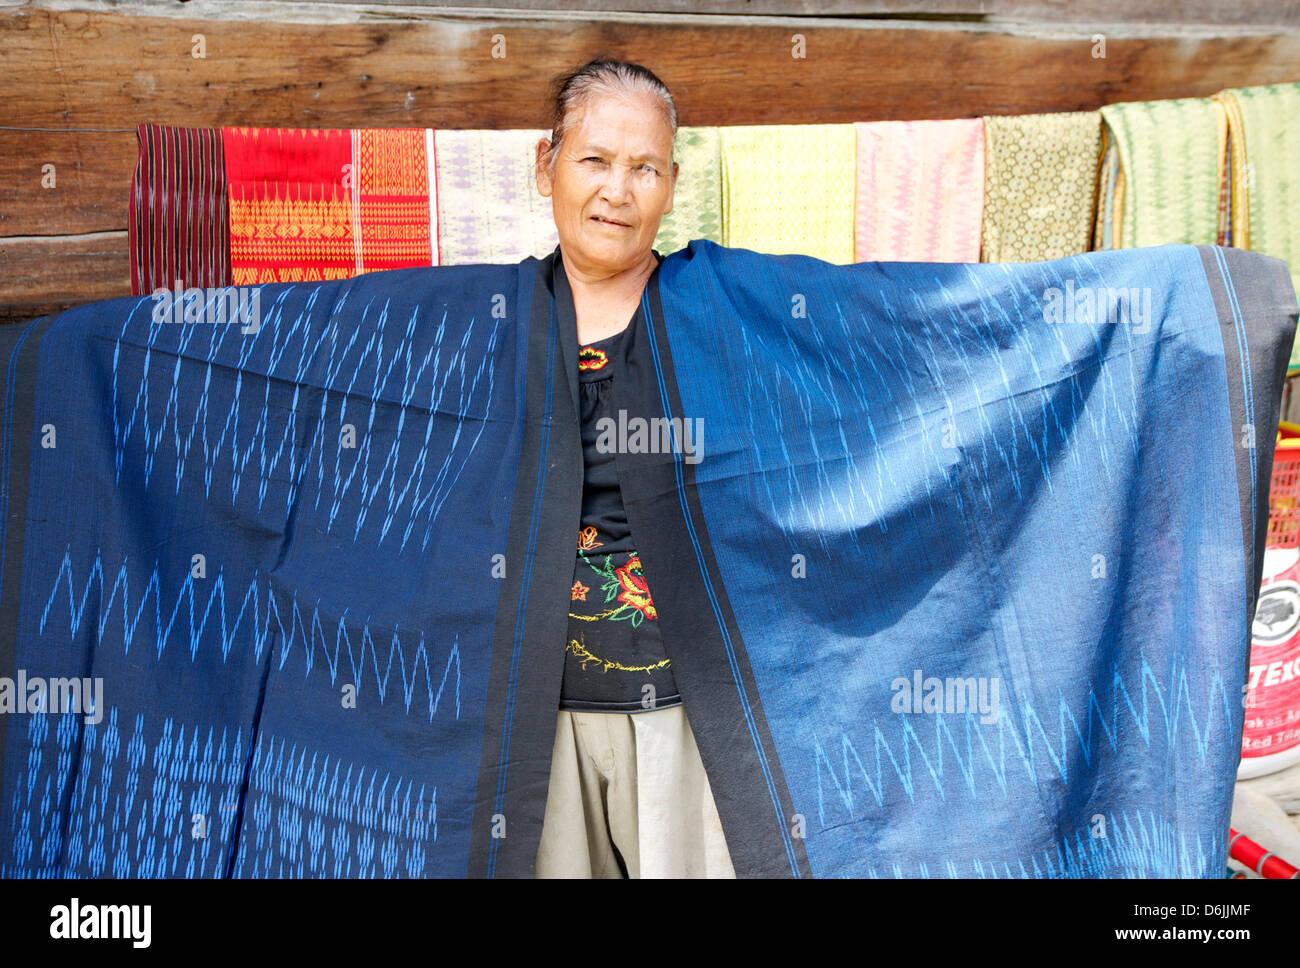 Batak tribeswoman with patterned Batak Toba sarongs, Buhit, Samosir Island, Lake Toba, Sumatra, Indonesia, Southeast - Stock Image